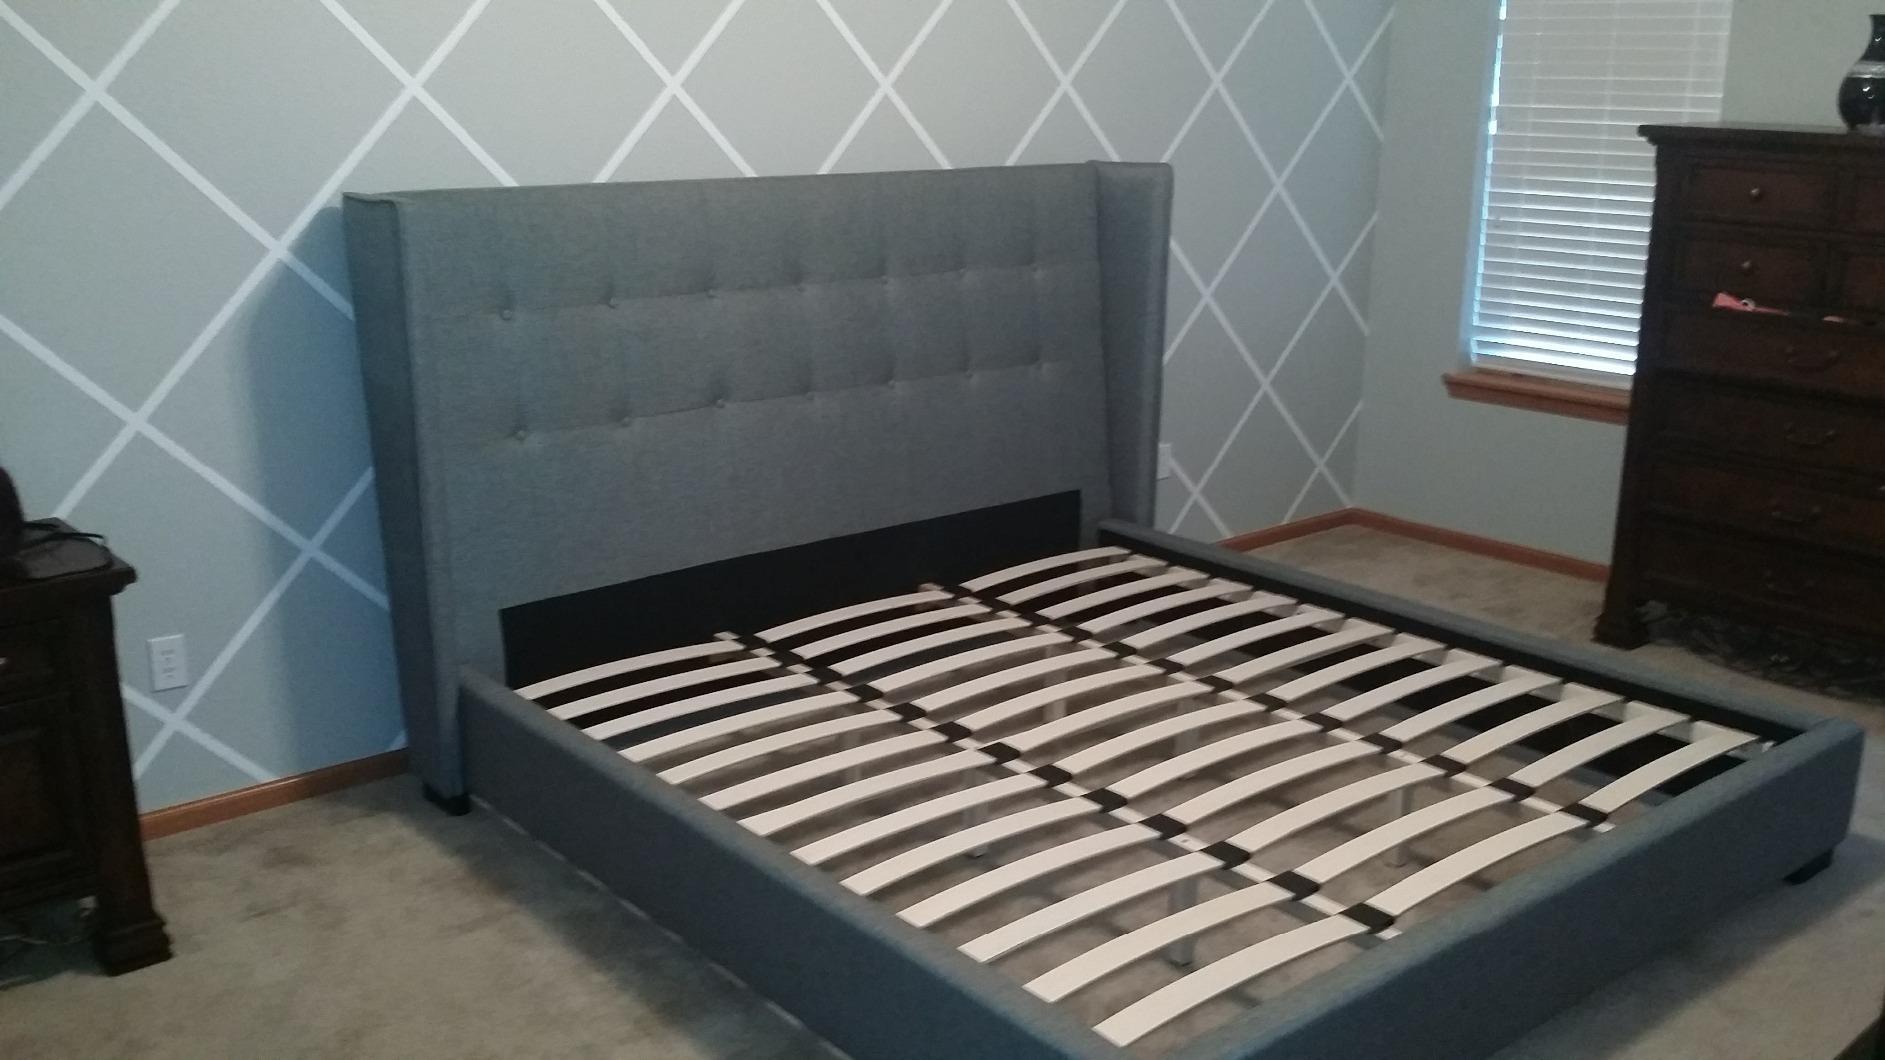 Baxton Studio Hirst Gray Platform Bed : Baxton studio bed king celine modern and